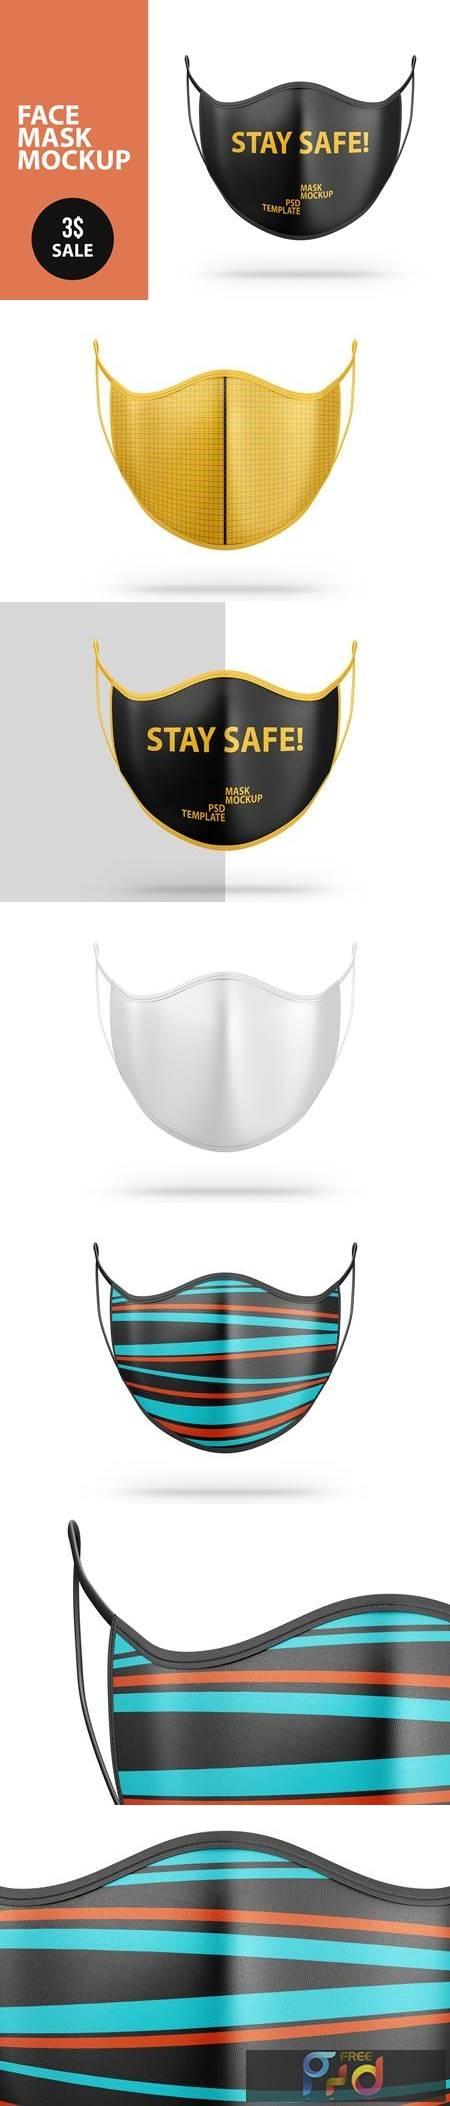 Anti Pollution Face Mask PSD Mockup 4872466 1